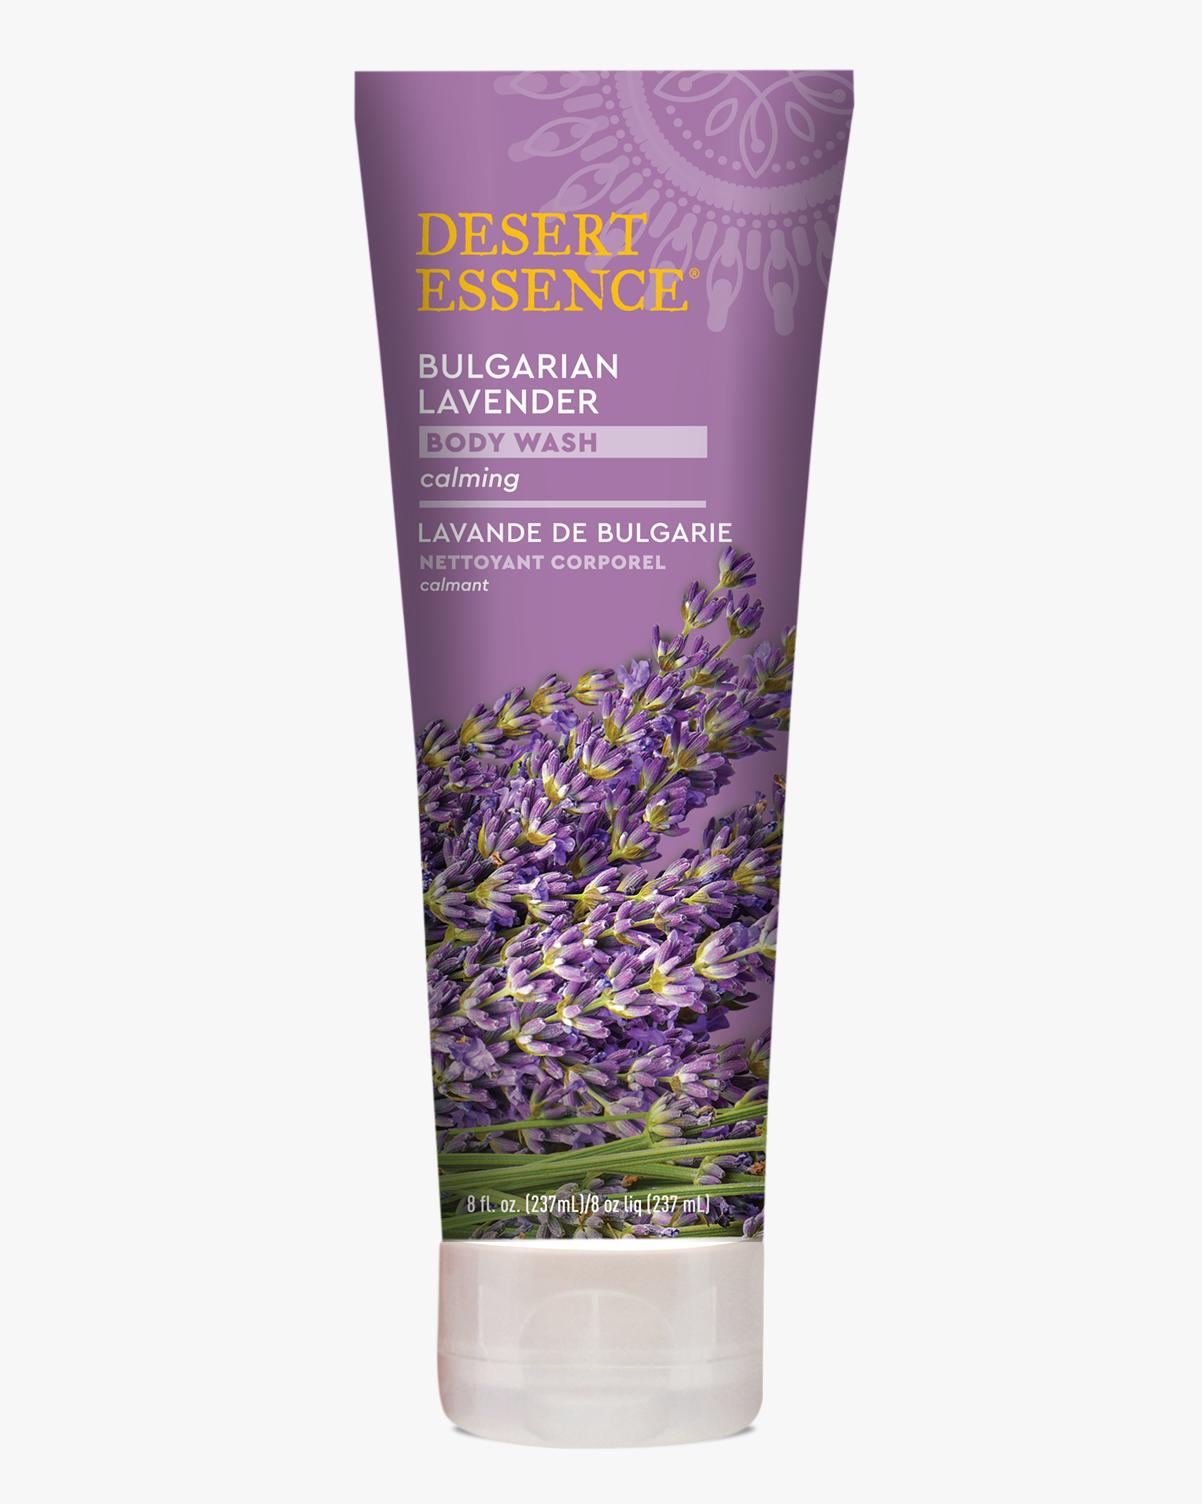 Desert Essence coupon: Desert Essence Bulgarian Lavender Body Wash, 8 fl. oz. | Vegan | Gluten-Free